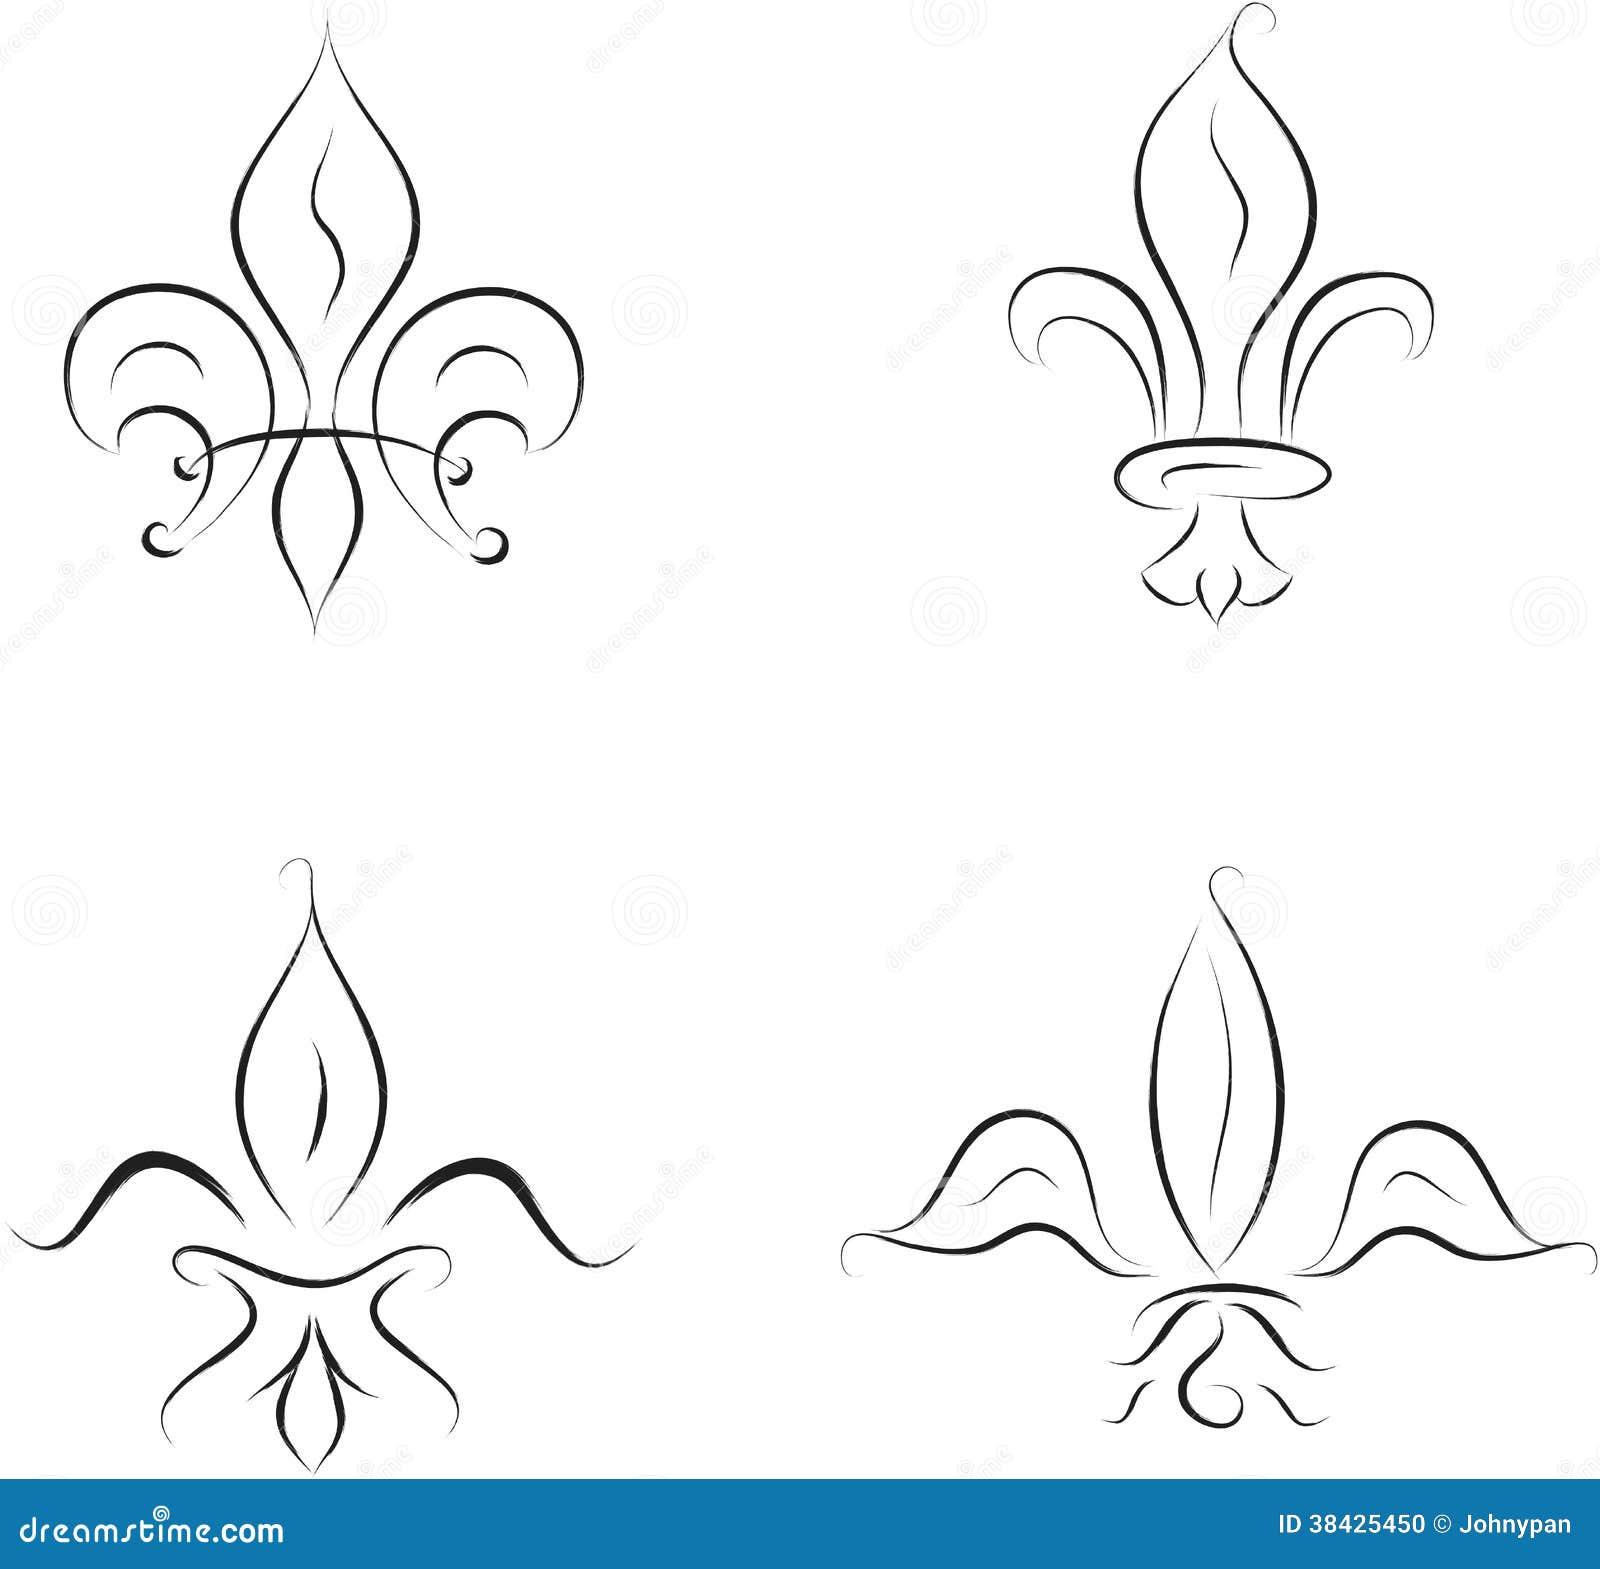 Fleur Illustration fleur de lis stock vector. illustration of france, gn - 38425450